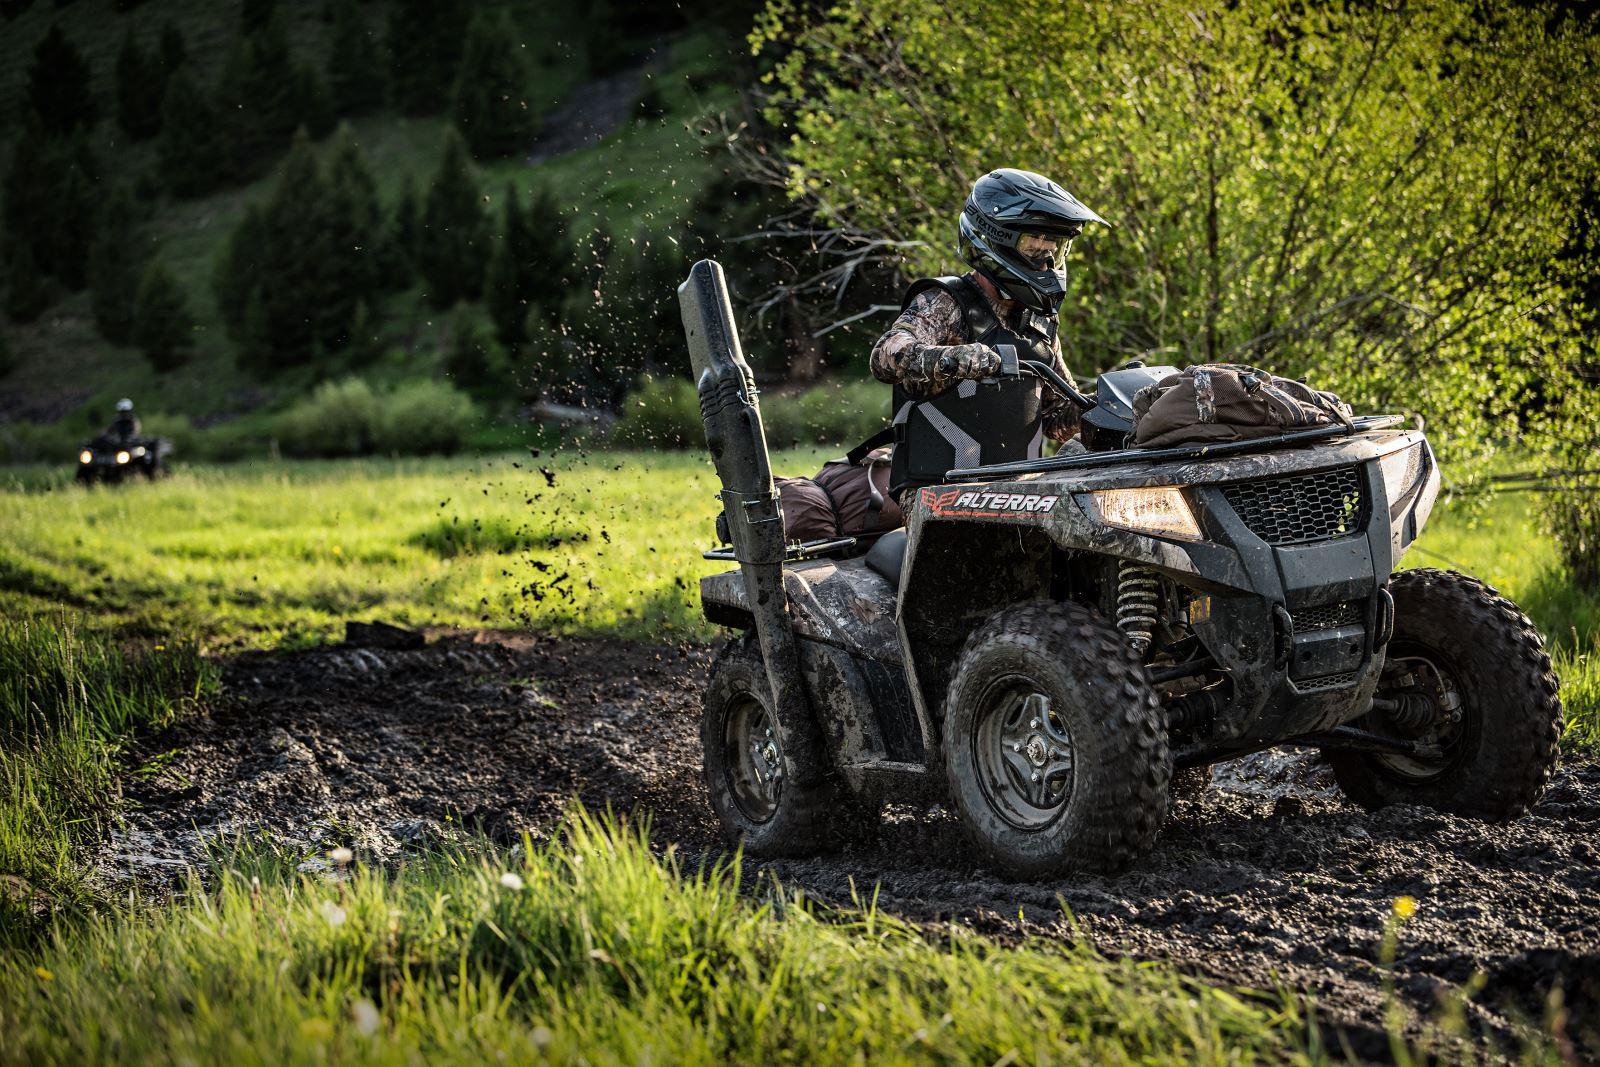 New Alterra 570 Headlines Textron Off Road's 2019 ATV Model